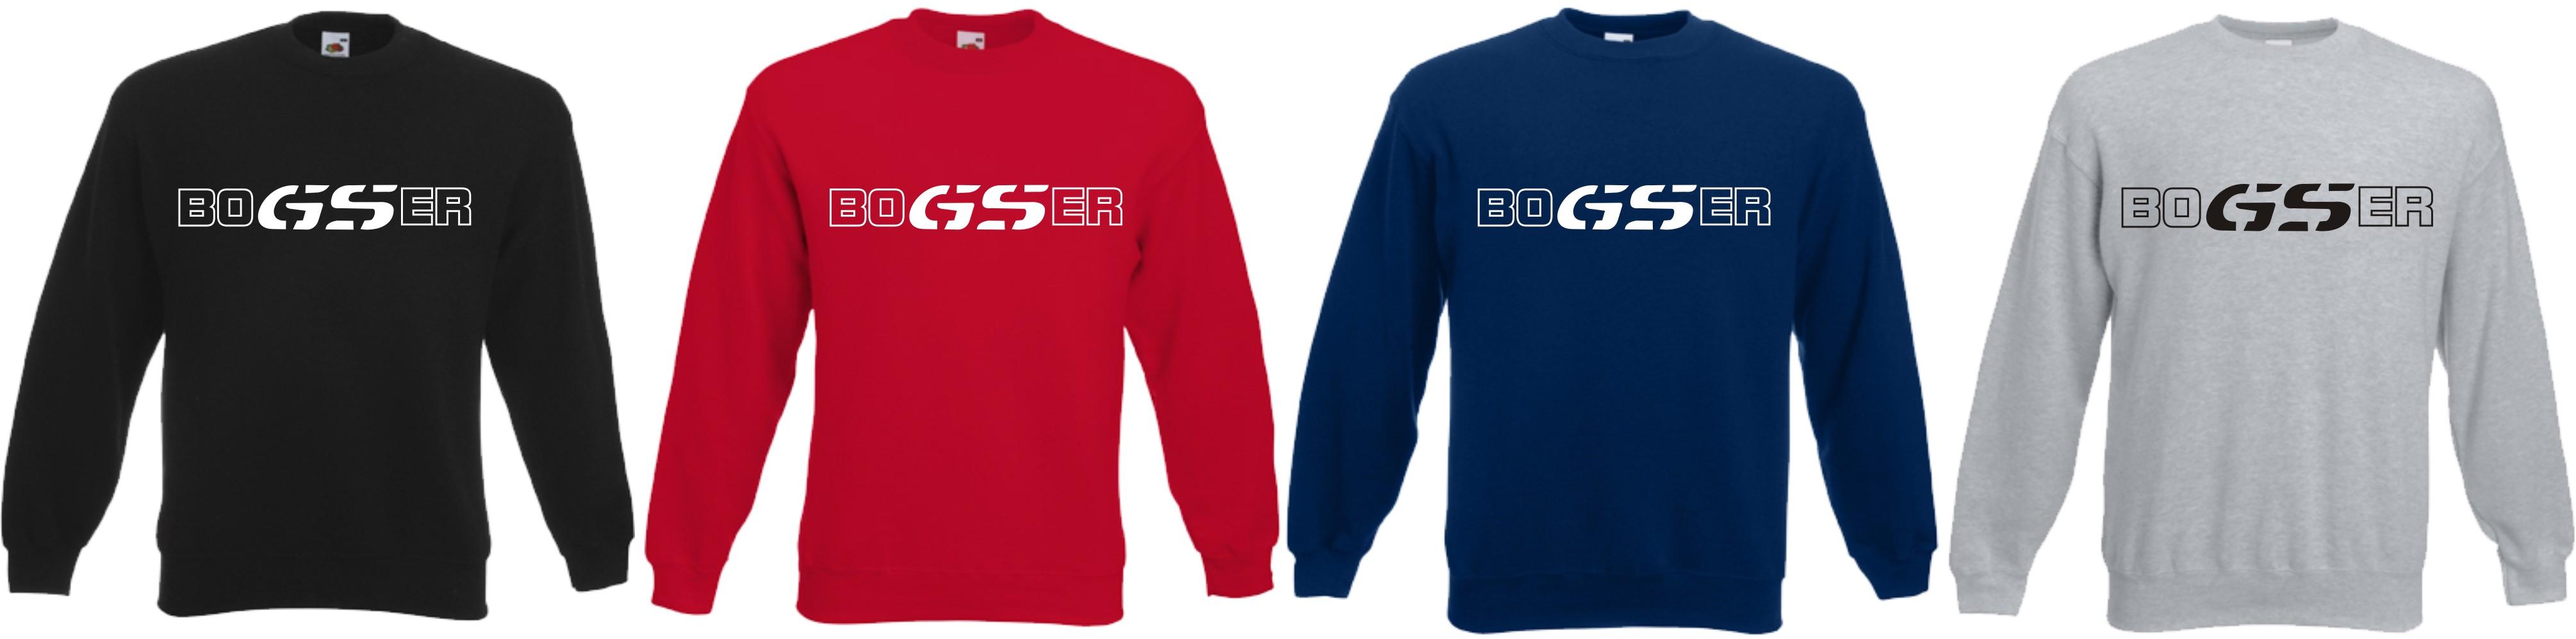 BOGSER_Sweater_alle_farben.jpg